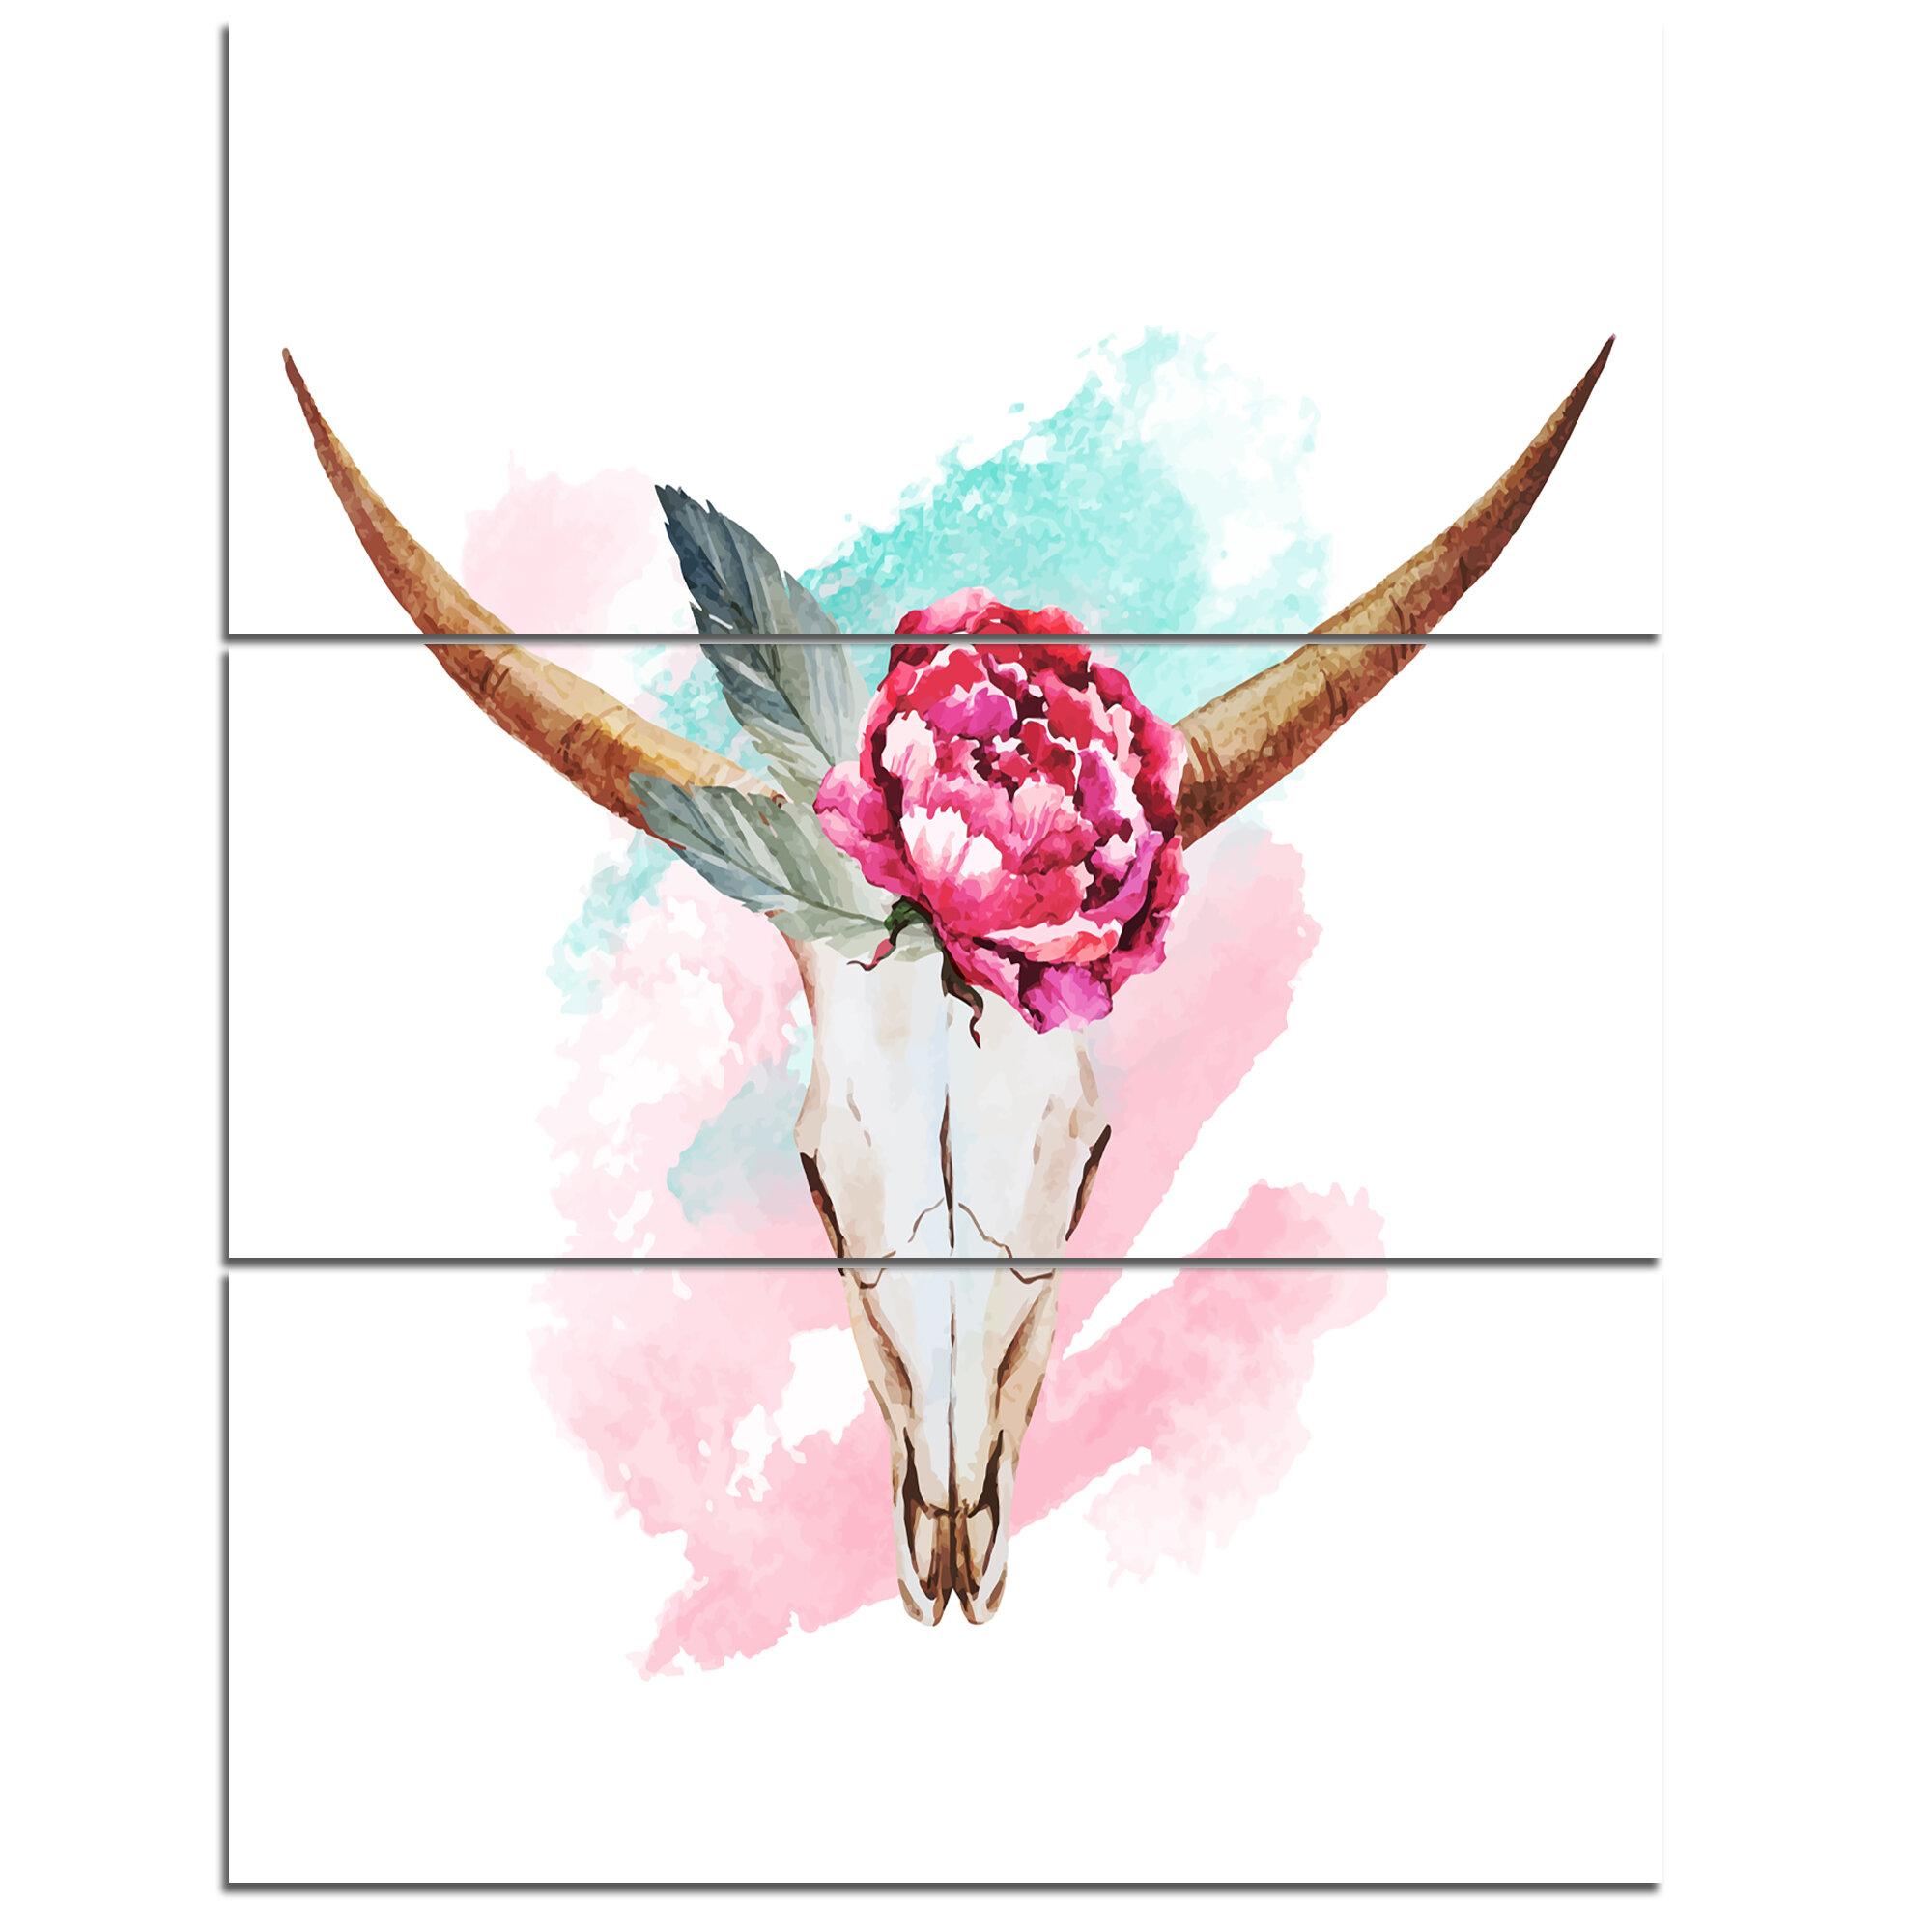 Designart Bull Skull And Flower 3 Piece Painting Print On Wrapped Canvas Set Wayfair